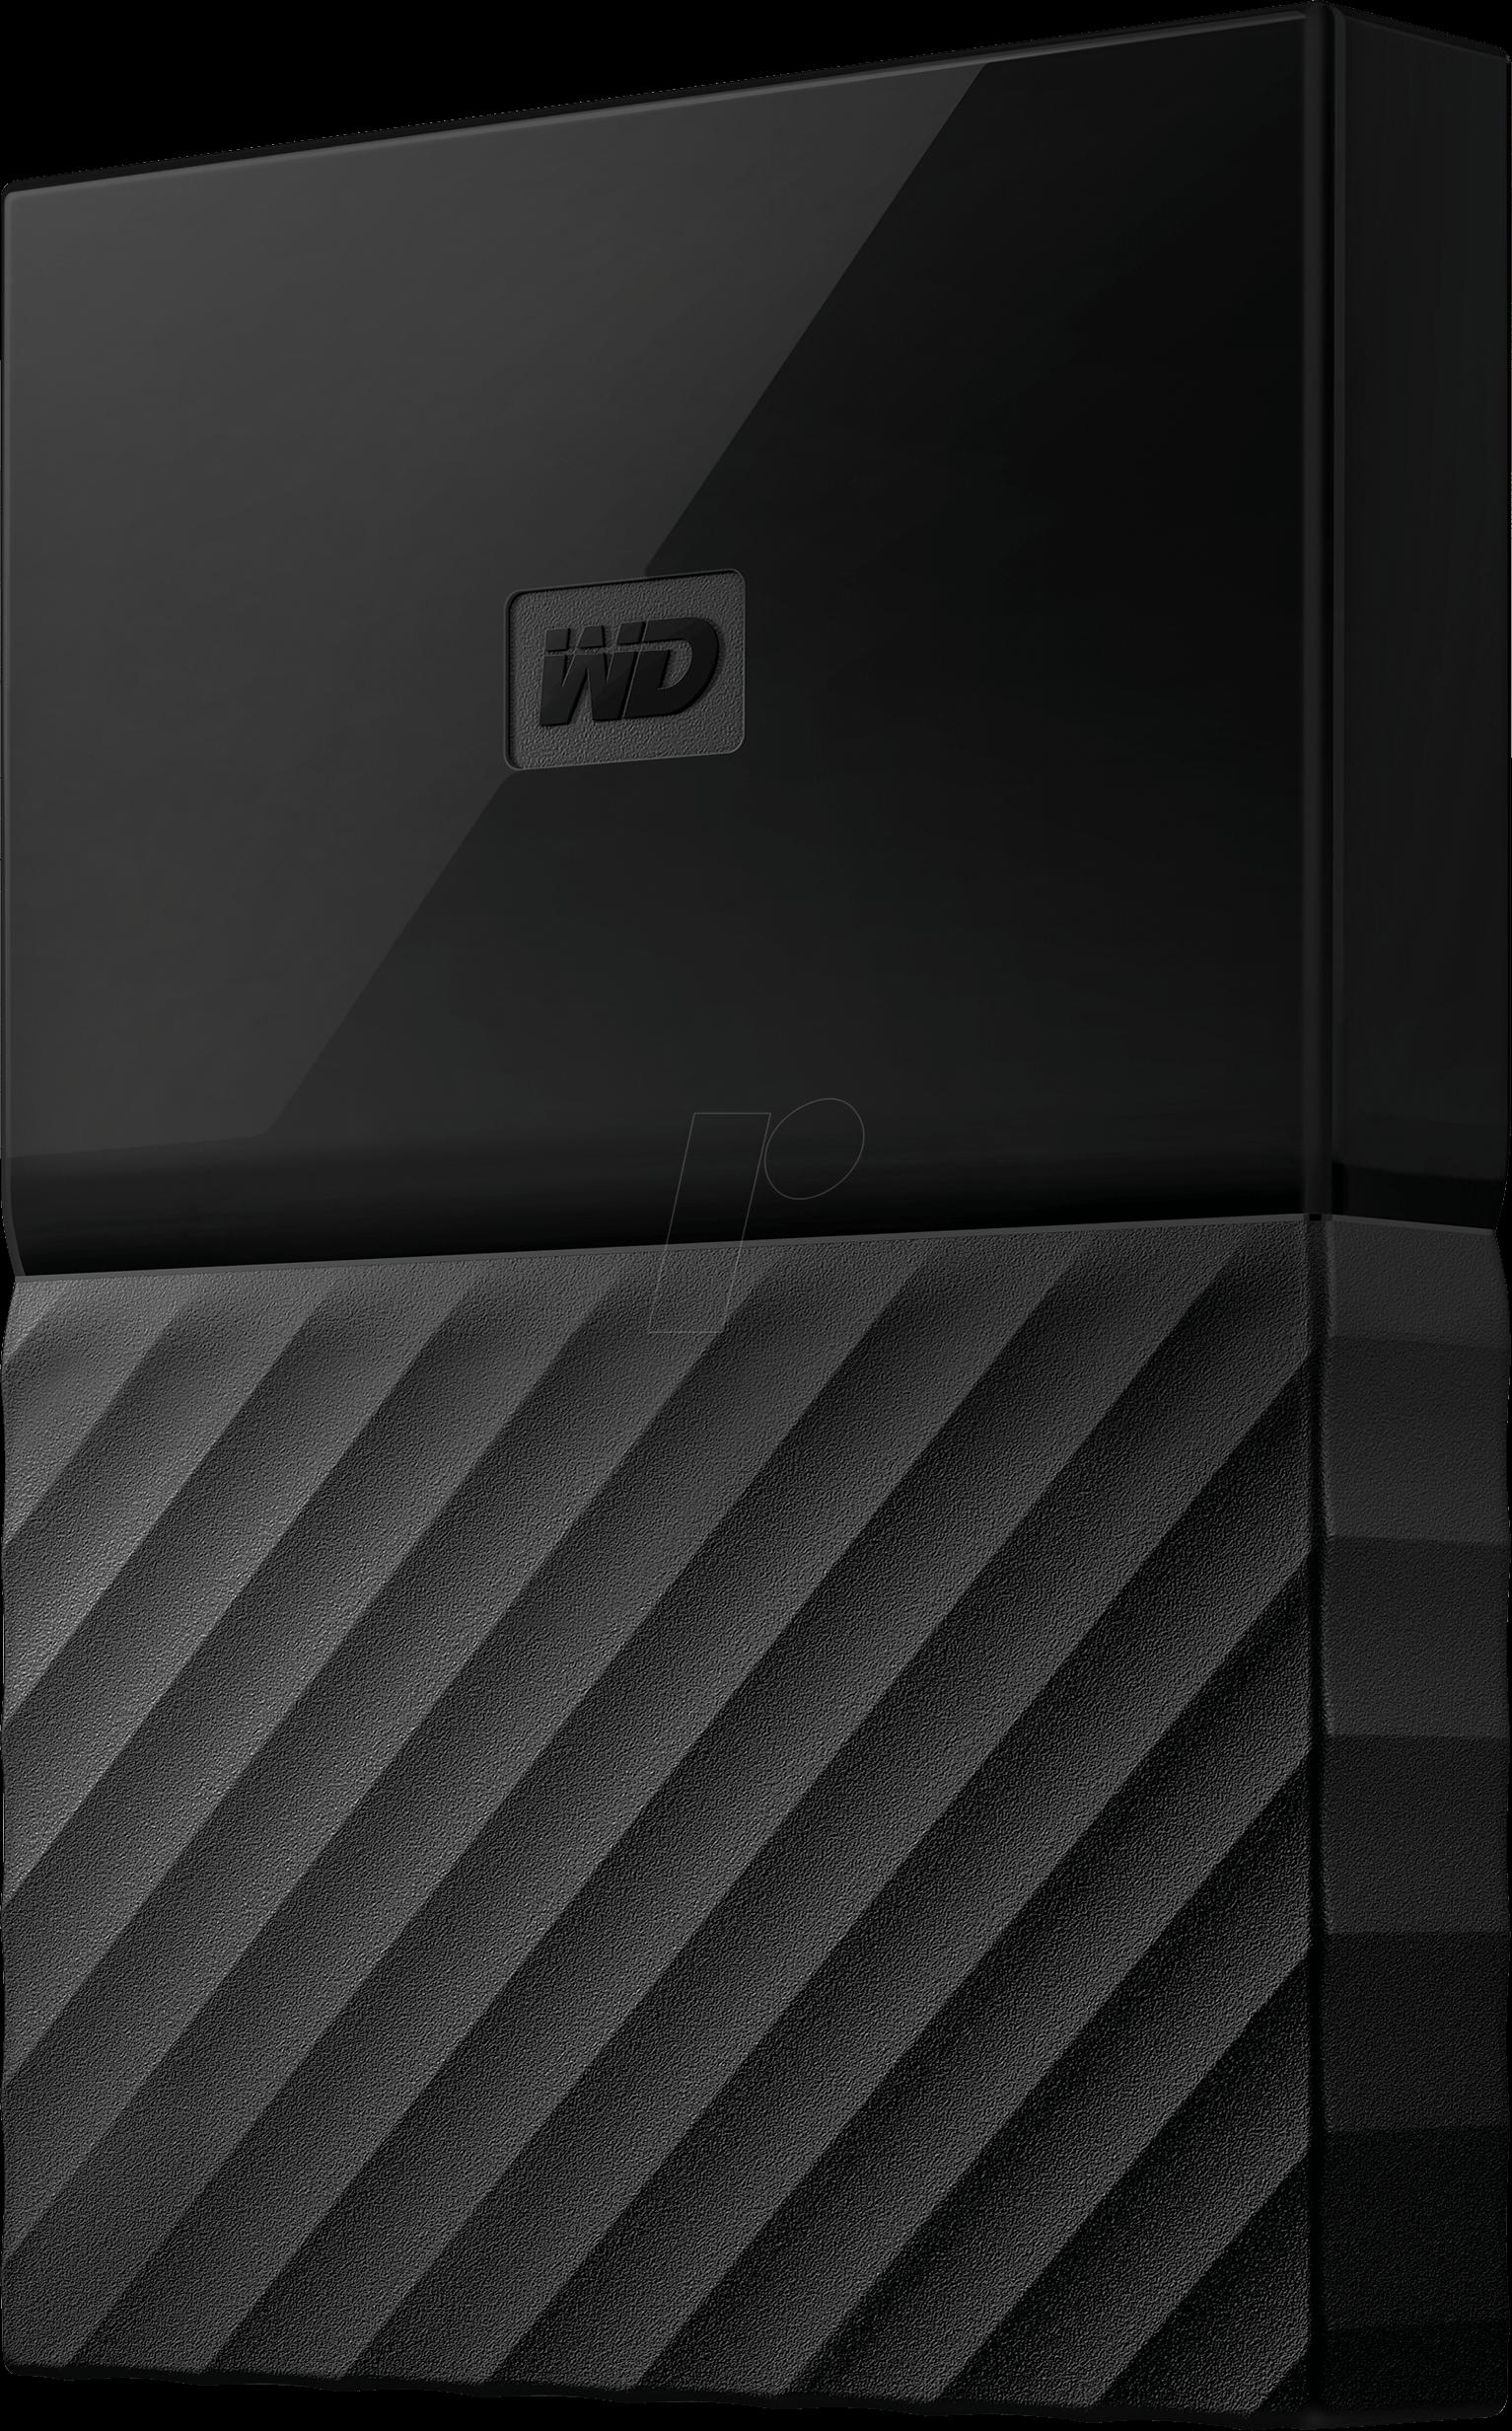 WDBFKF0010BBK - WD 1TB My Passport for Mac Portable Hard Drive